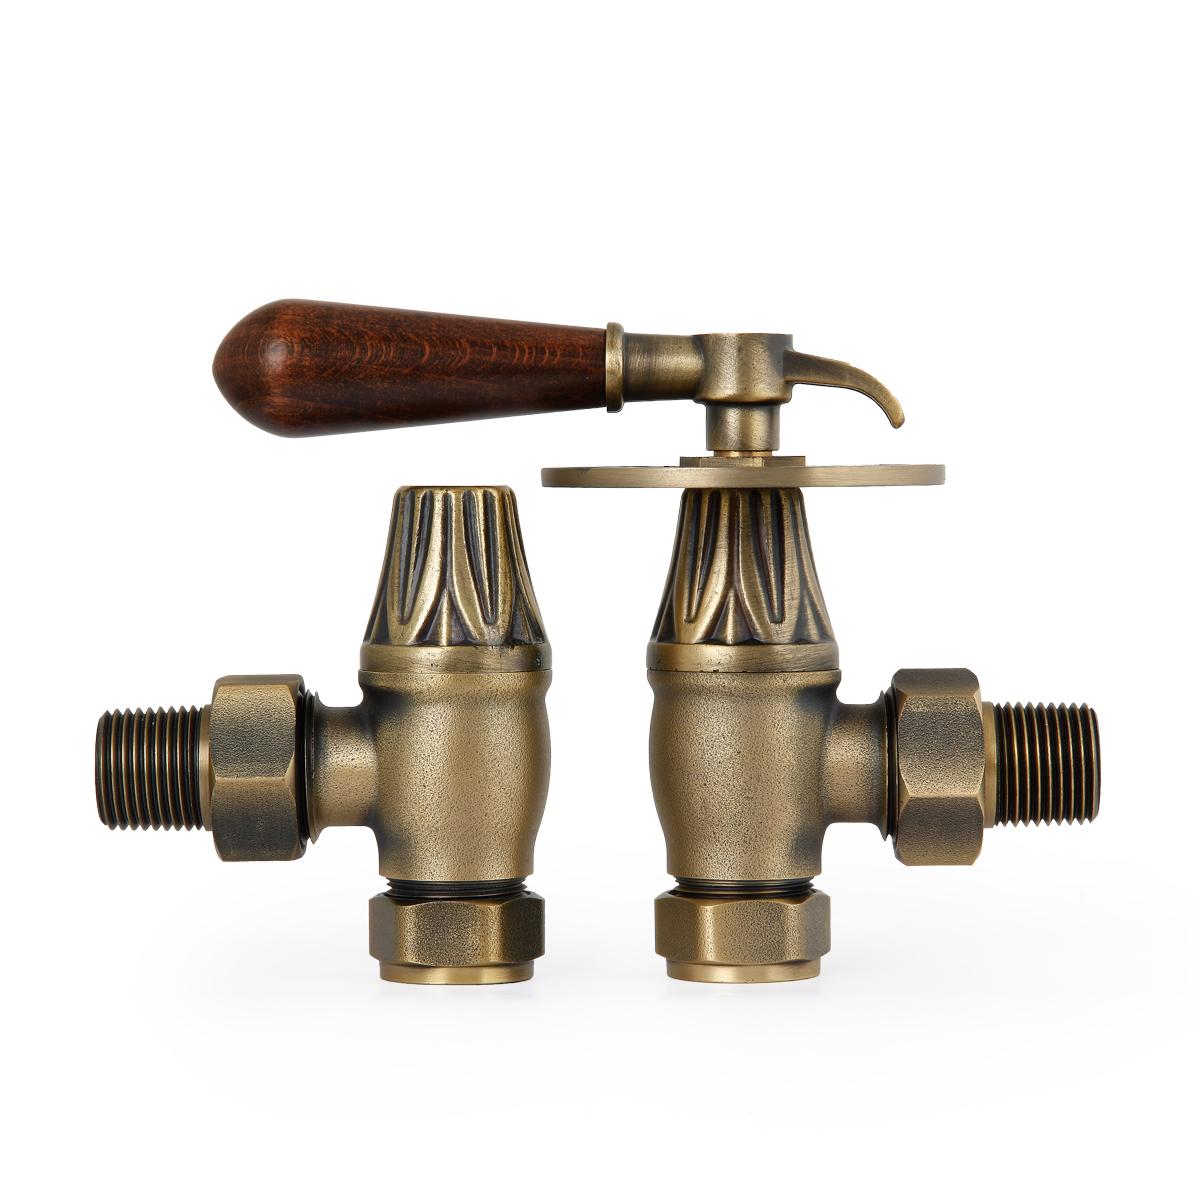 Brass Lever Valve : Natural brass renaissance lever handle valves period